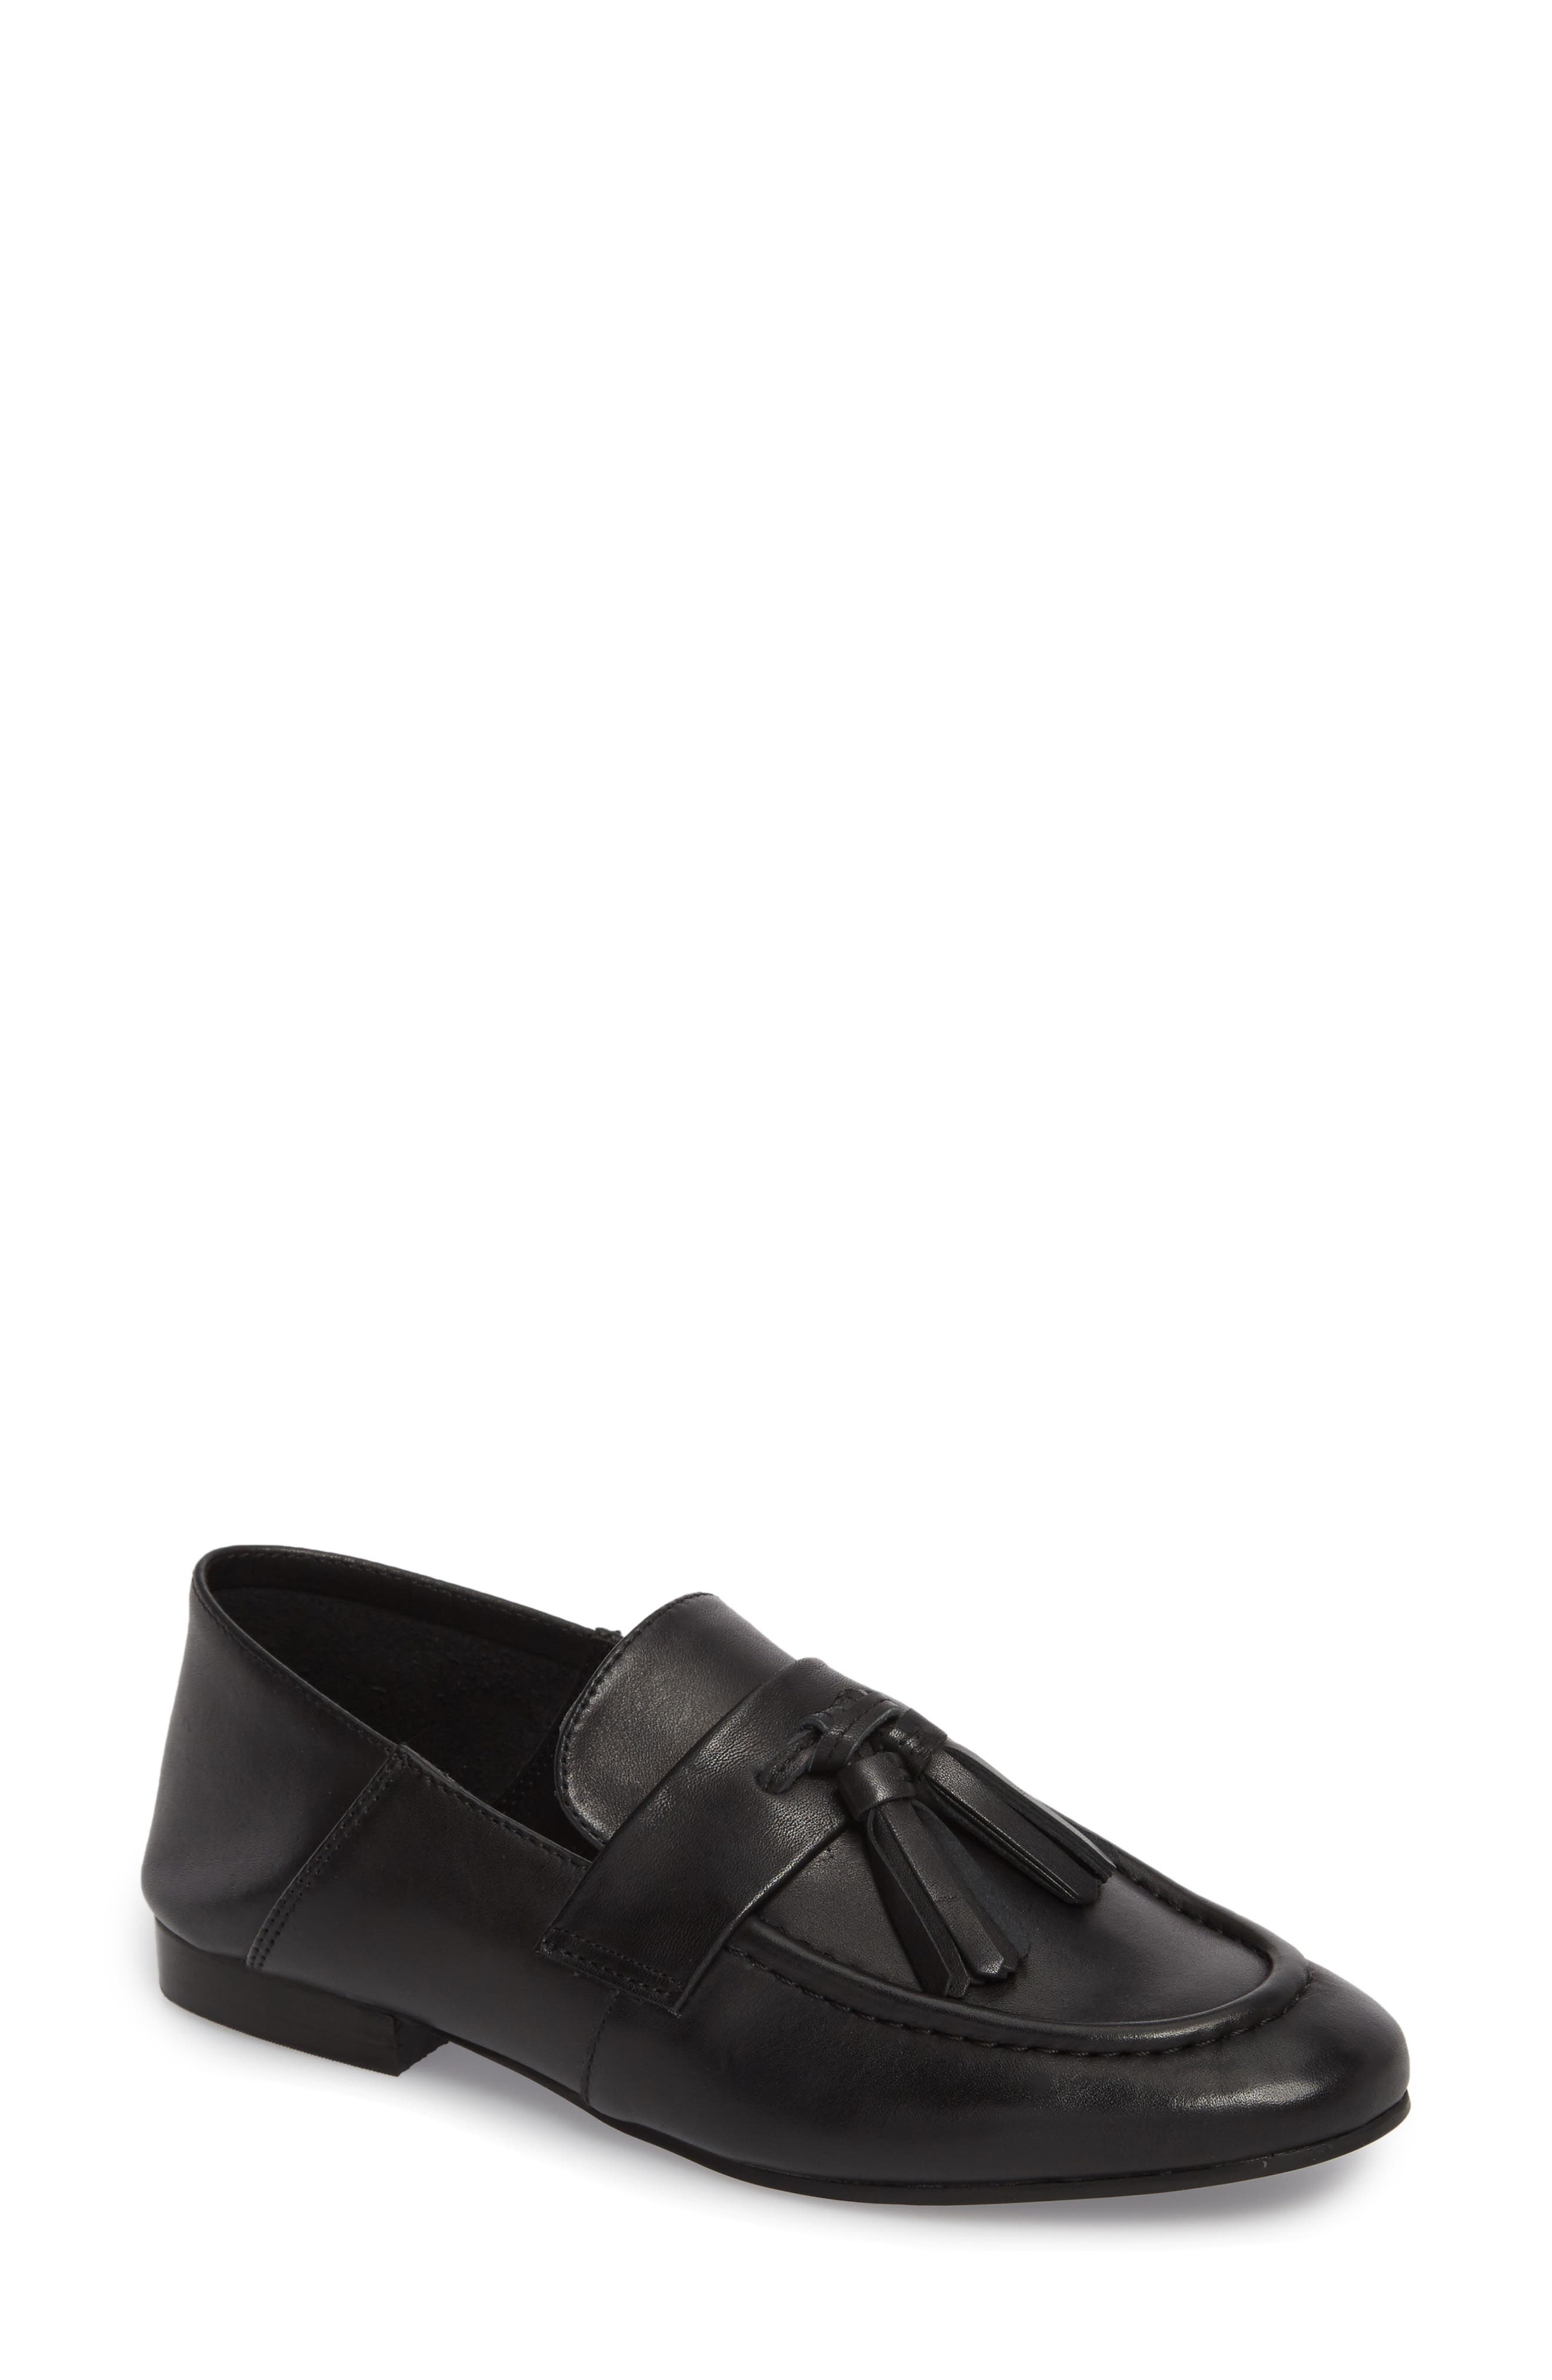 Beck Convertible Tasseled Loafer,                         Main,                         color, 001